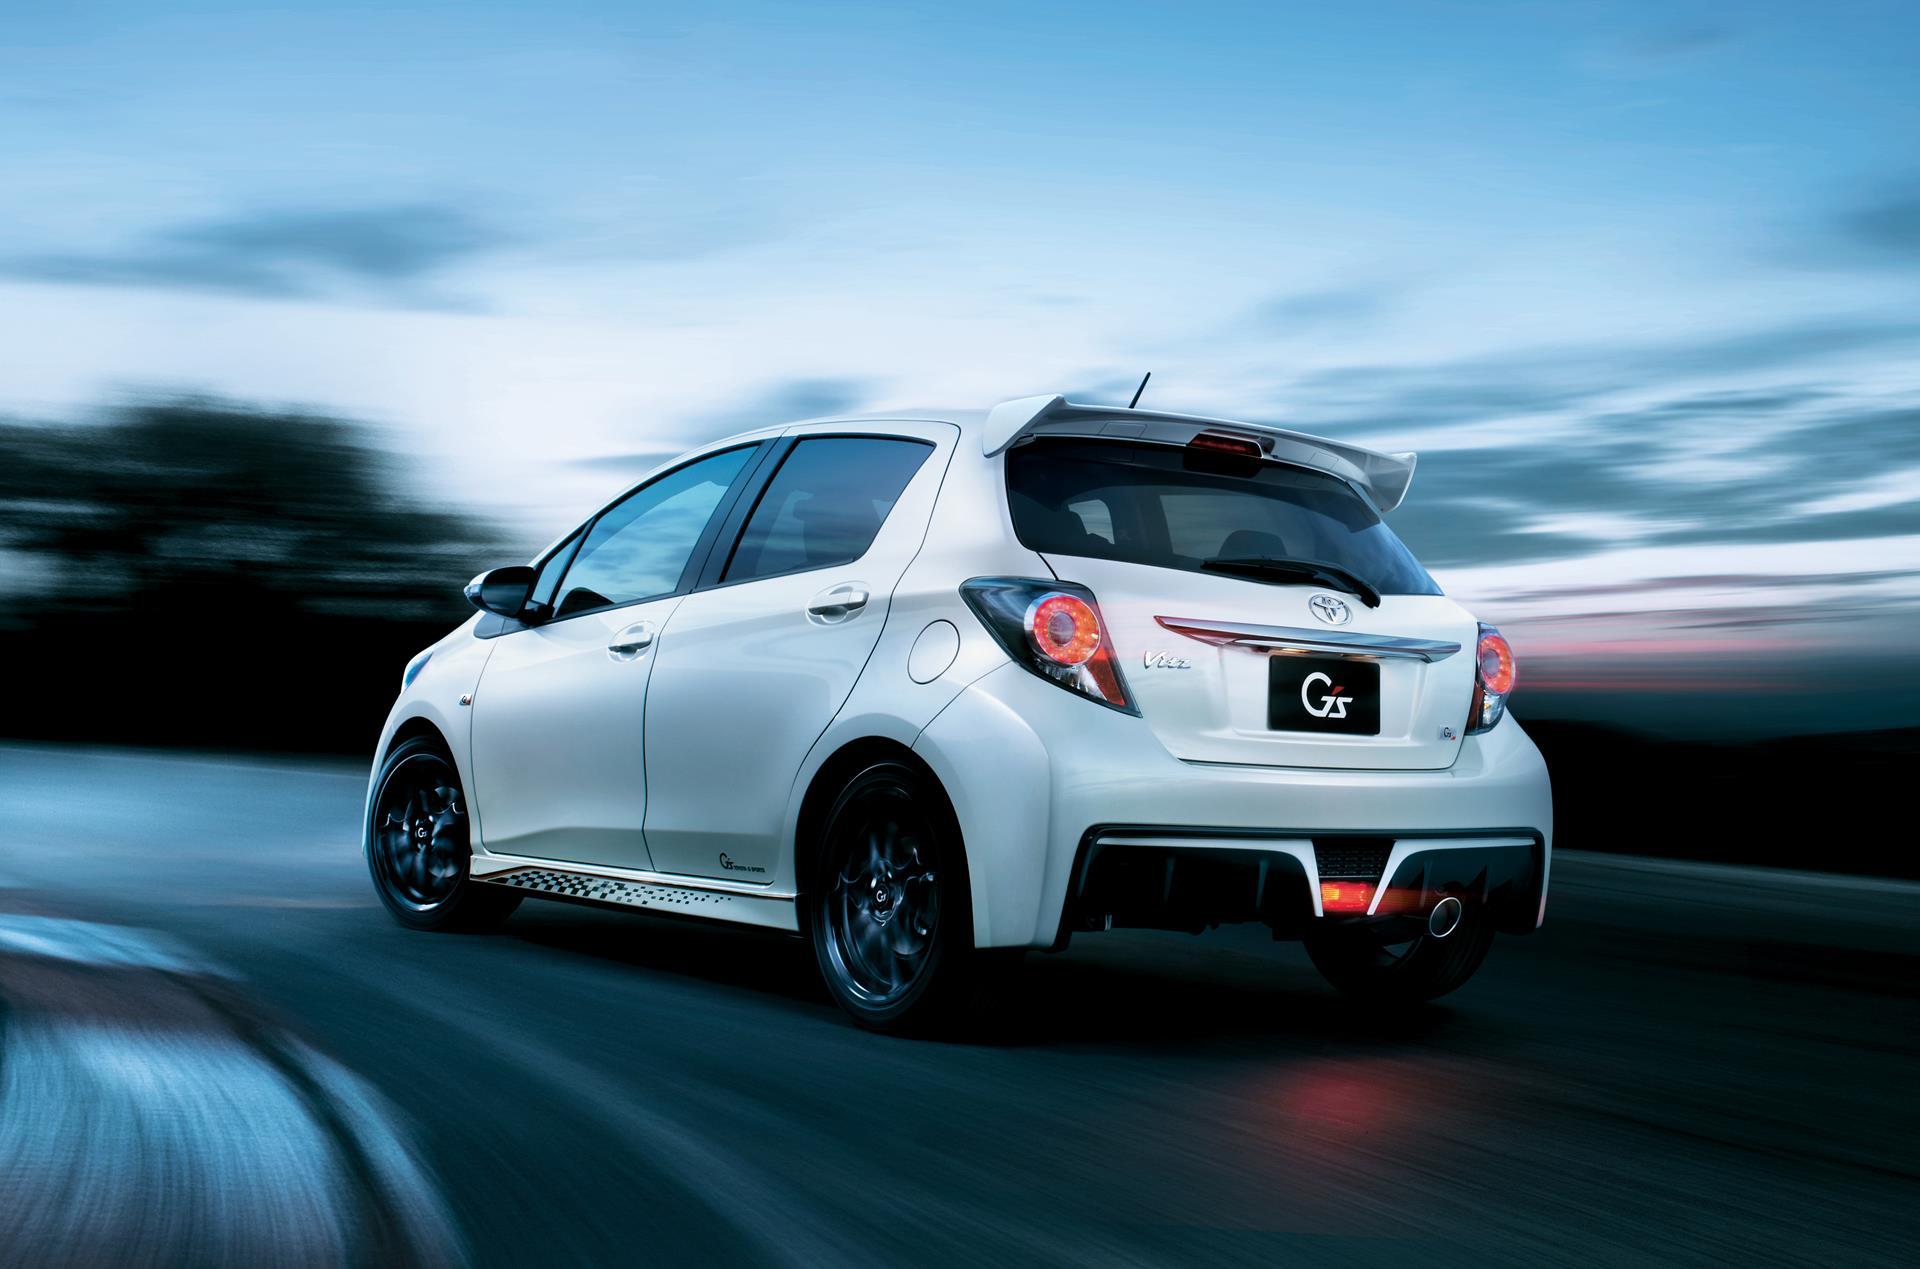 Car Lineup Wallpaper Toyota Yaris Vitz Gets Aygo Style Facelift Autoevolution